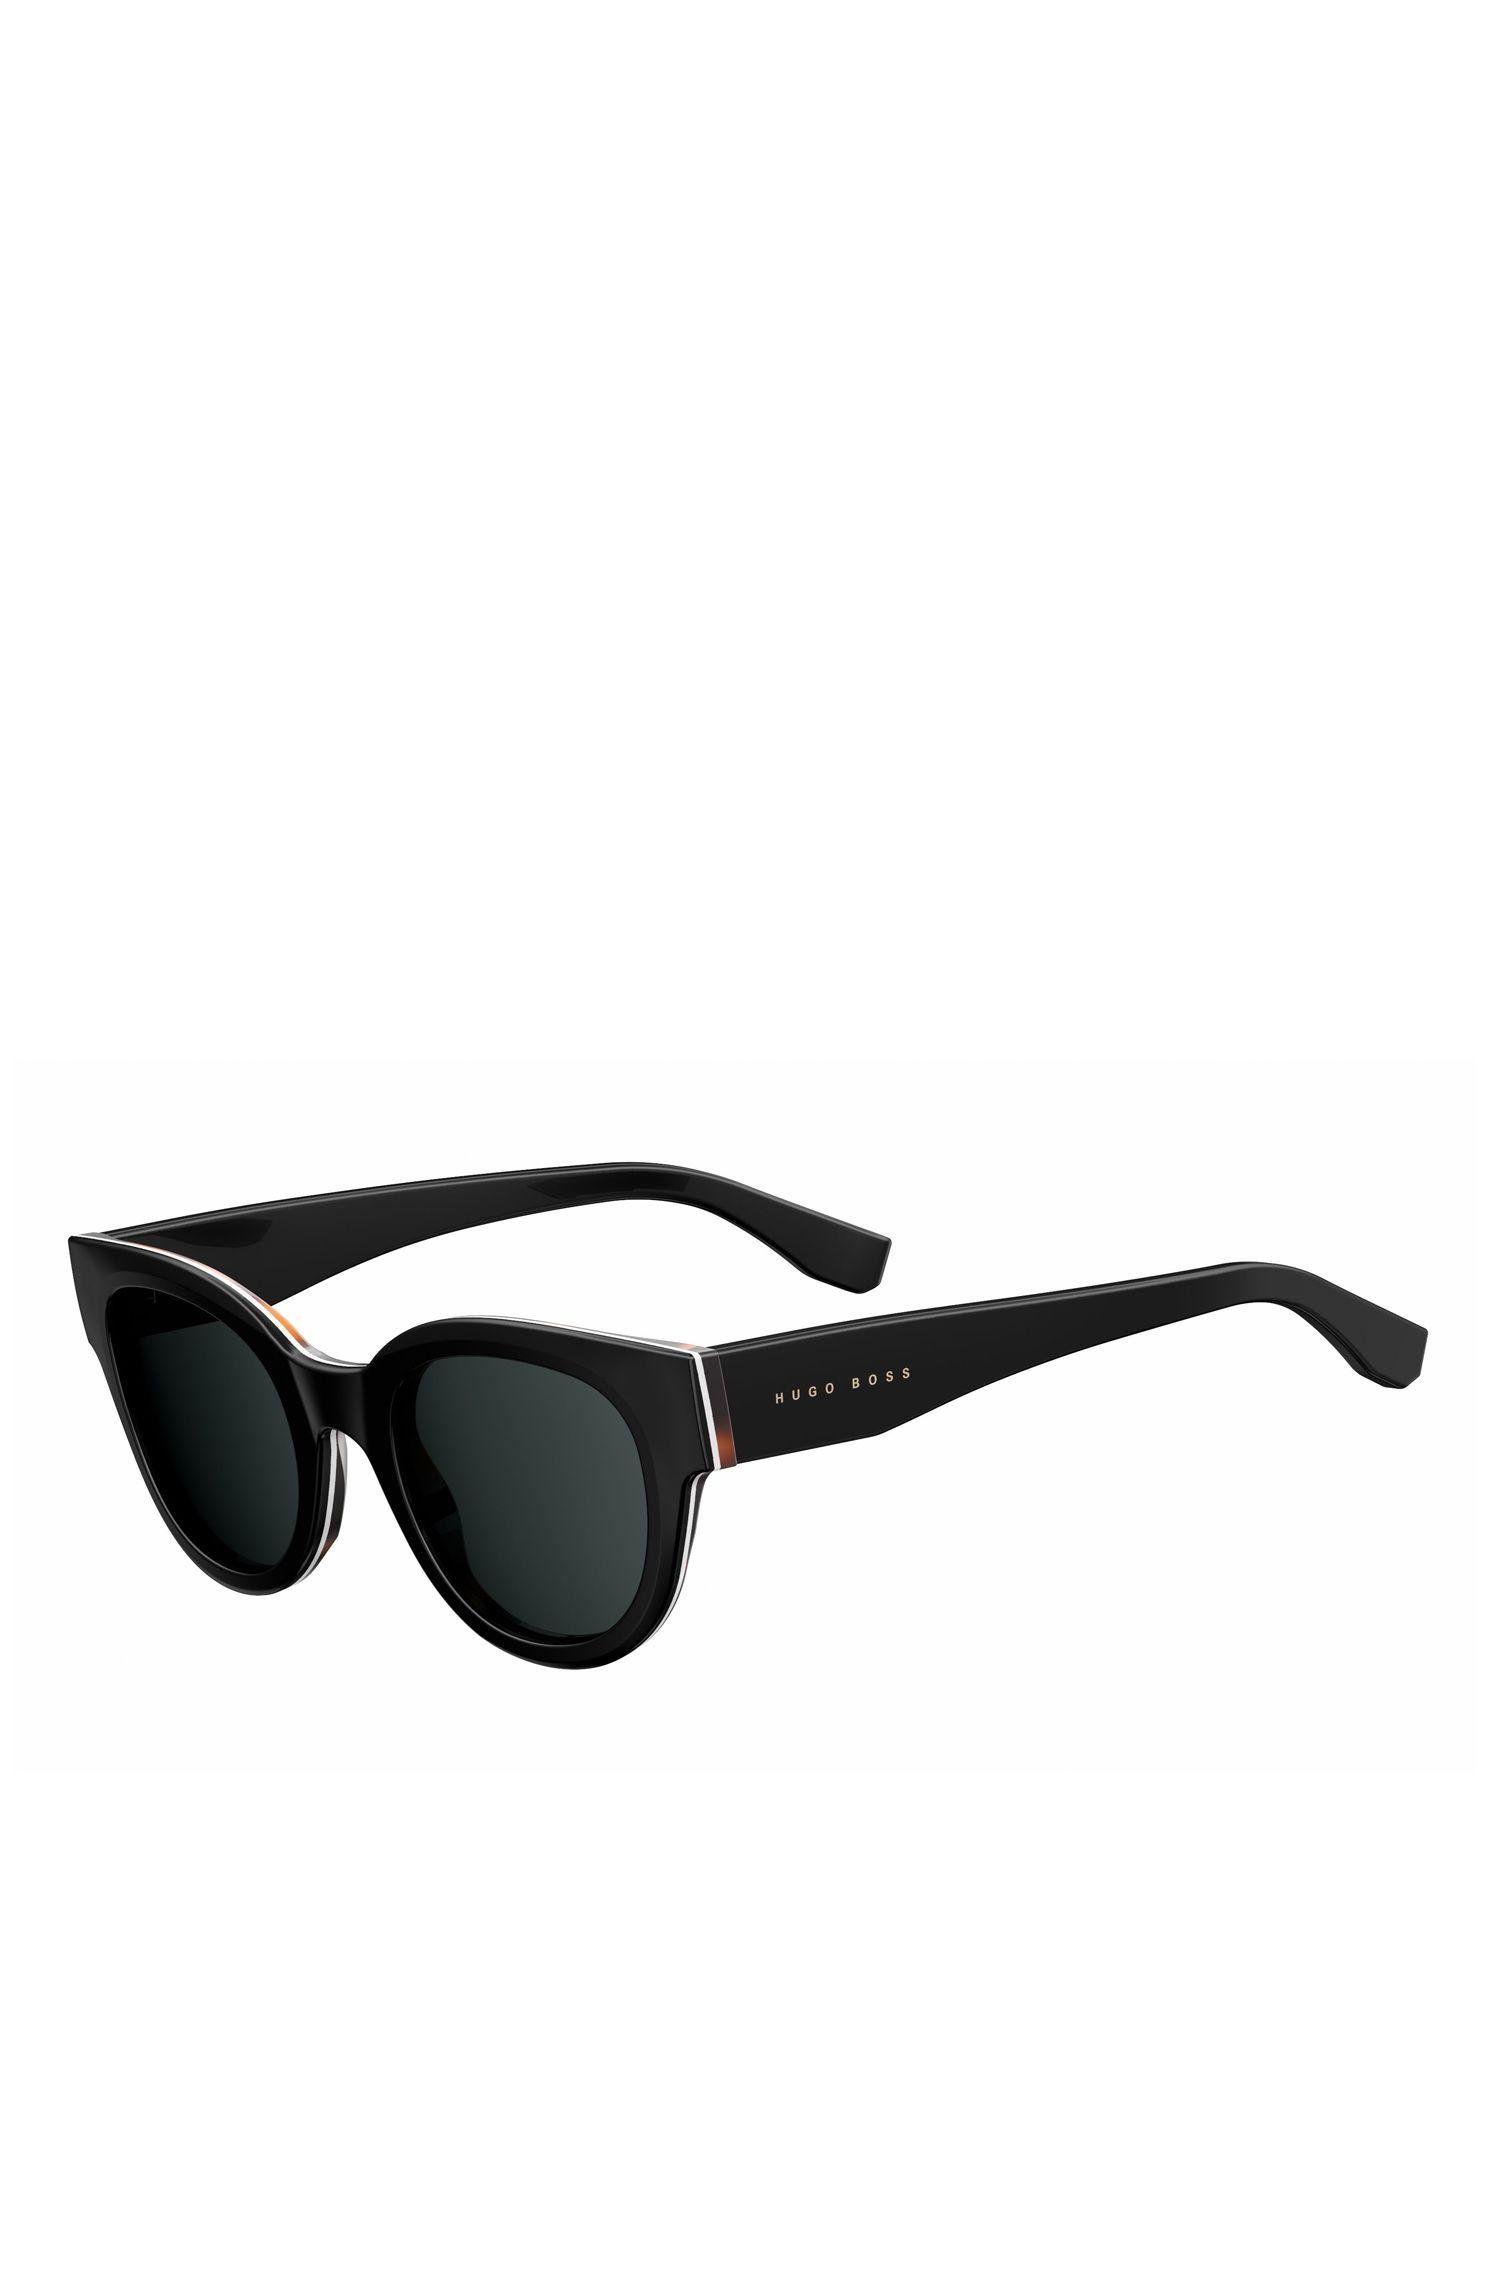 'BOSS 0888S' | Black Lens Block Cat Eye Sunglasses